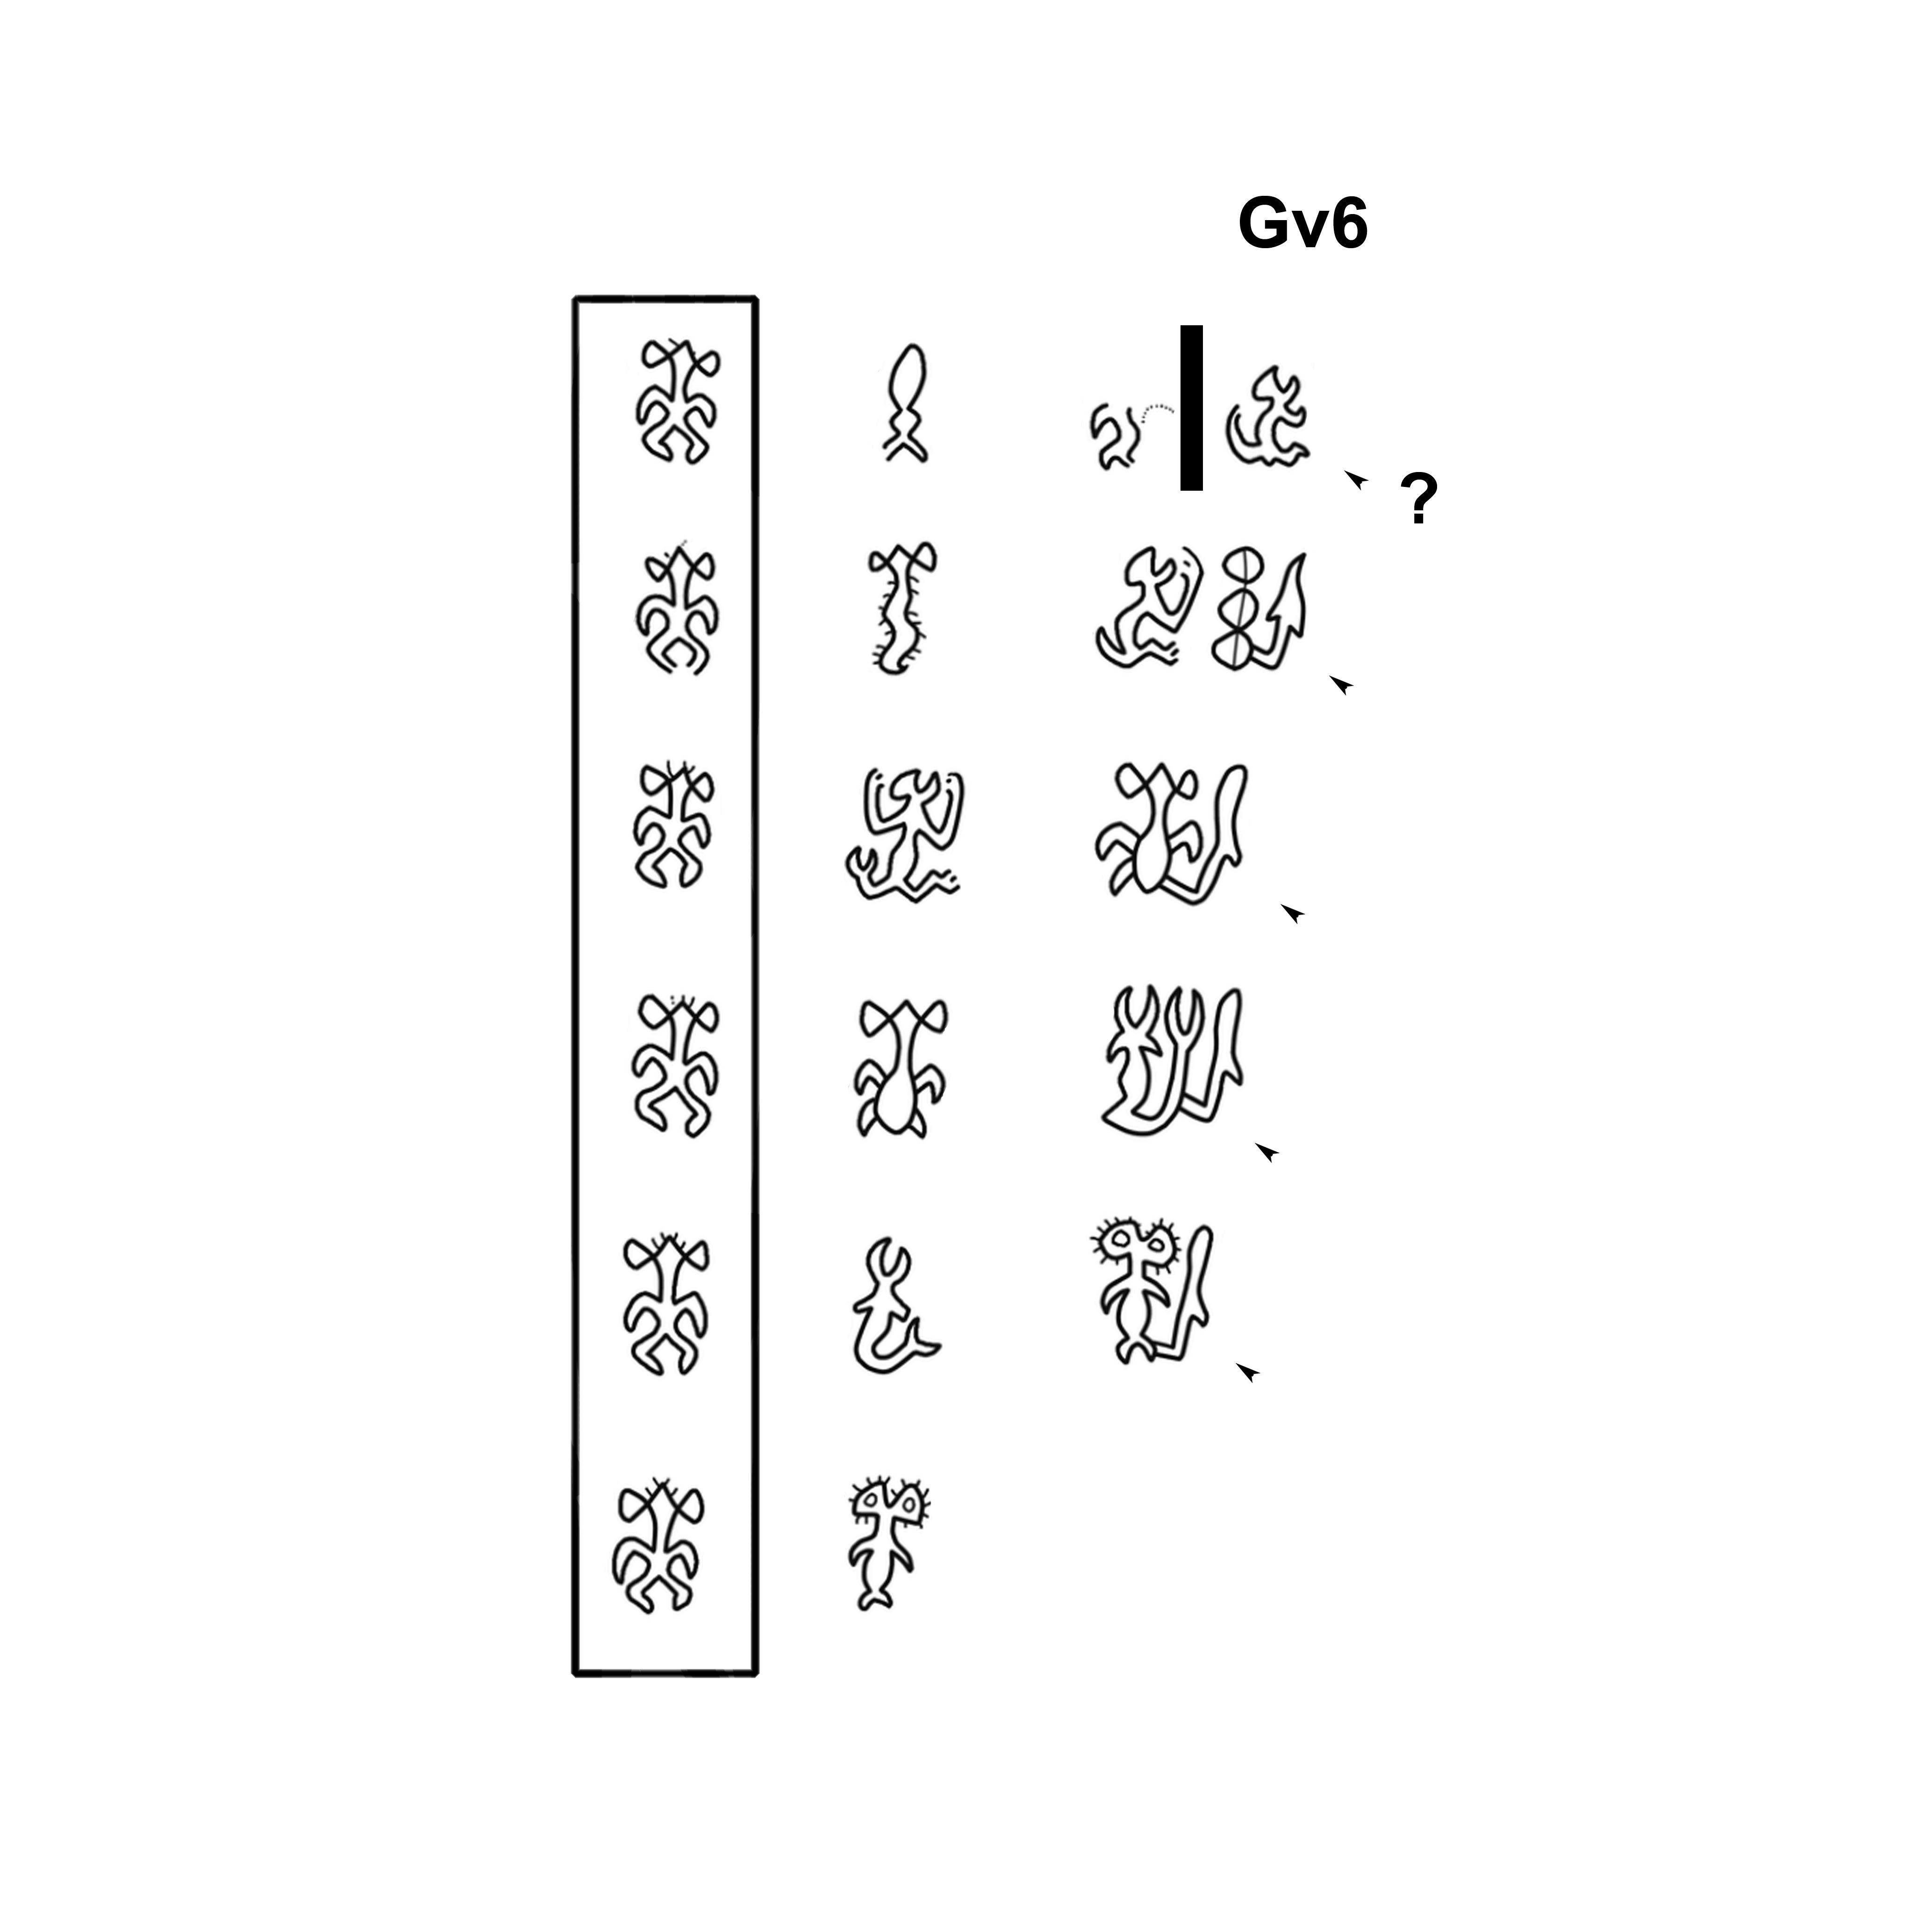 Name in the Kohau Rongorongo script (Easter Island)